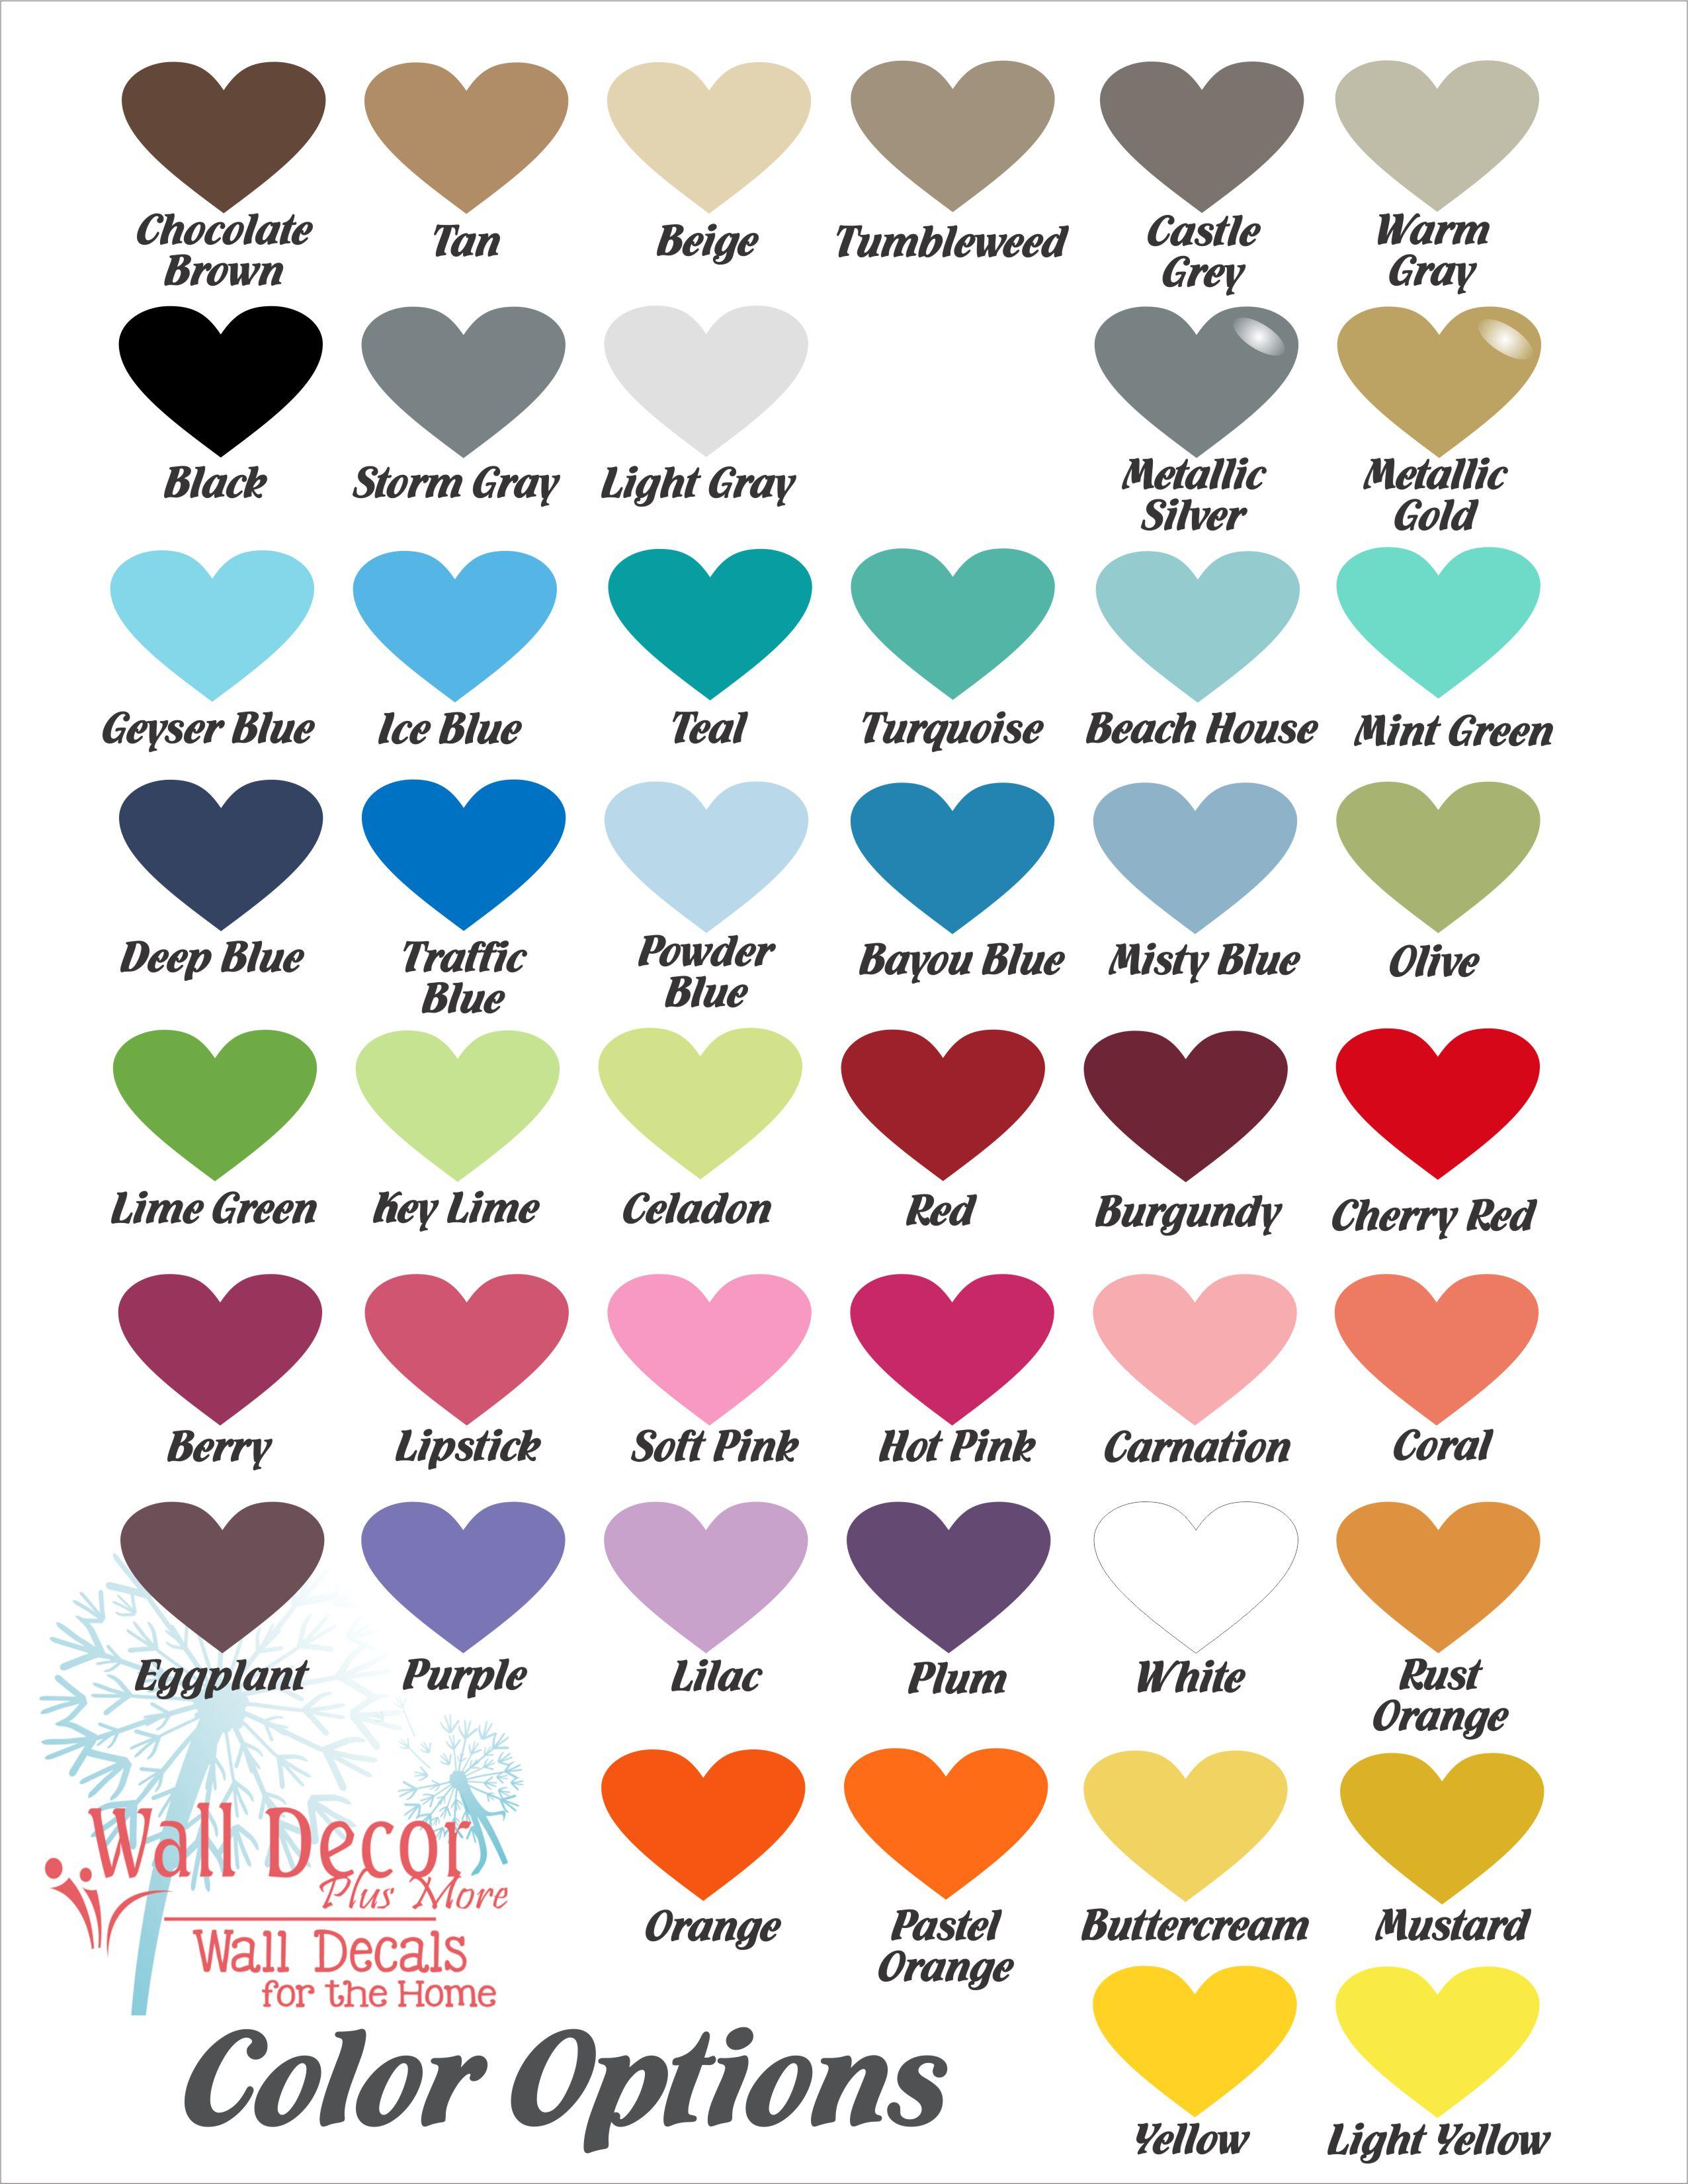 color-options-chart-web-091417.jpg